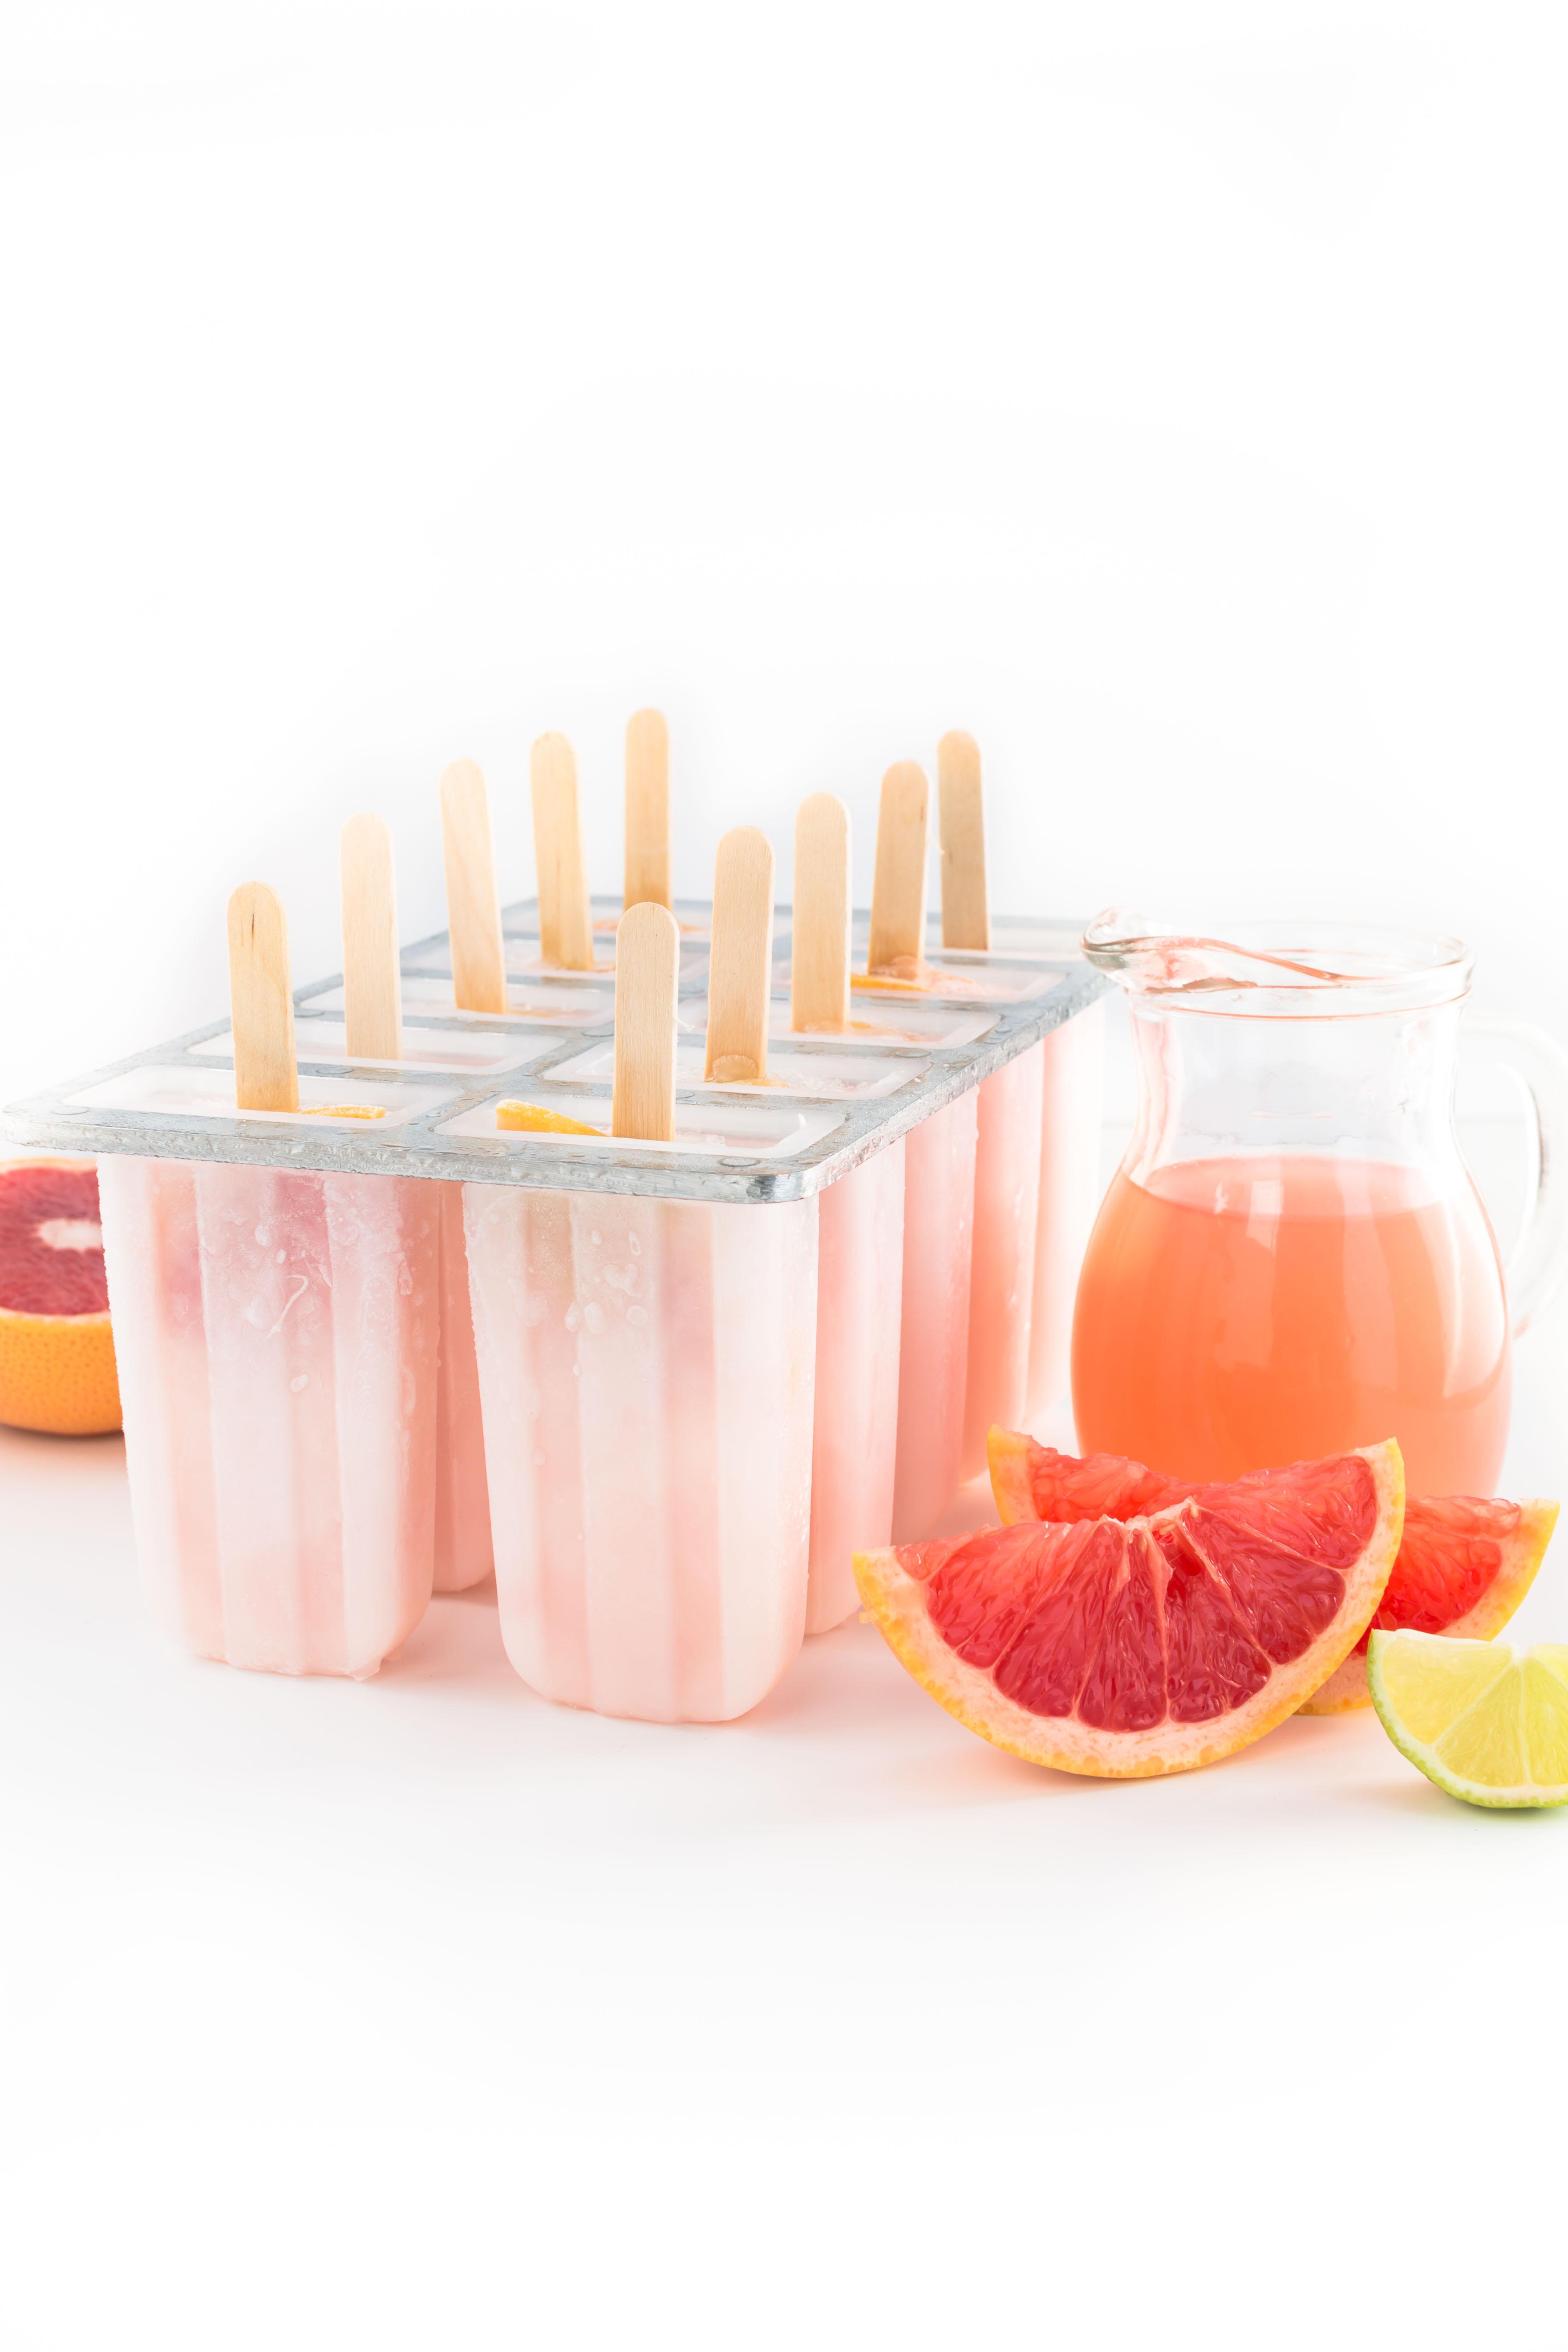 vegan PINK GRAPEFRUIT POPSICLES 3 ingredients easy & delicious - GHIACCIOLI al POMPELMO ROSA - limonata al pompelmo